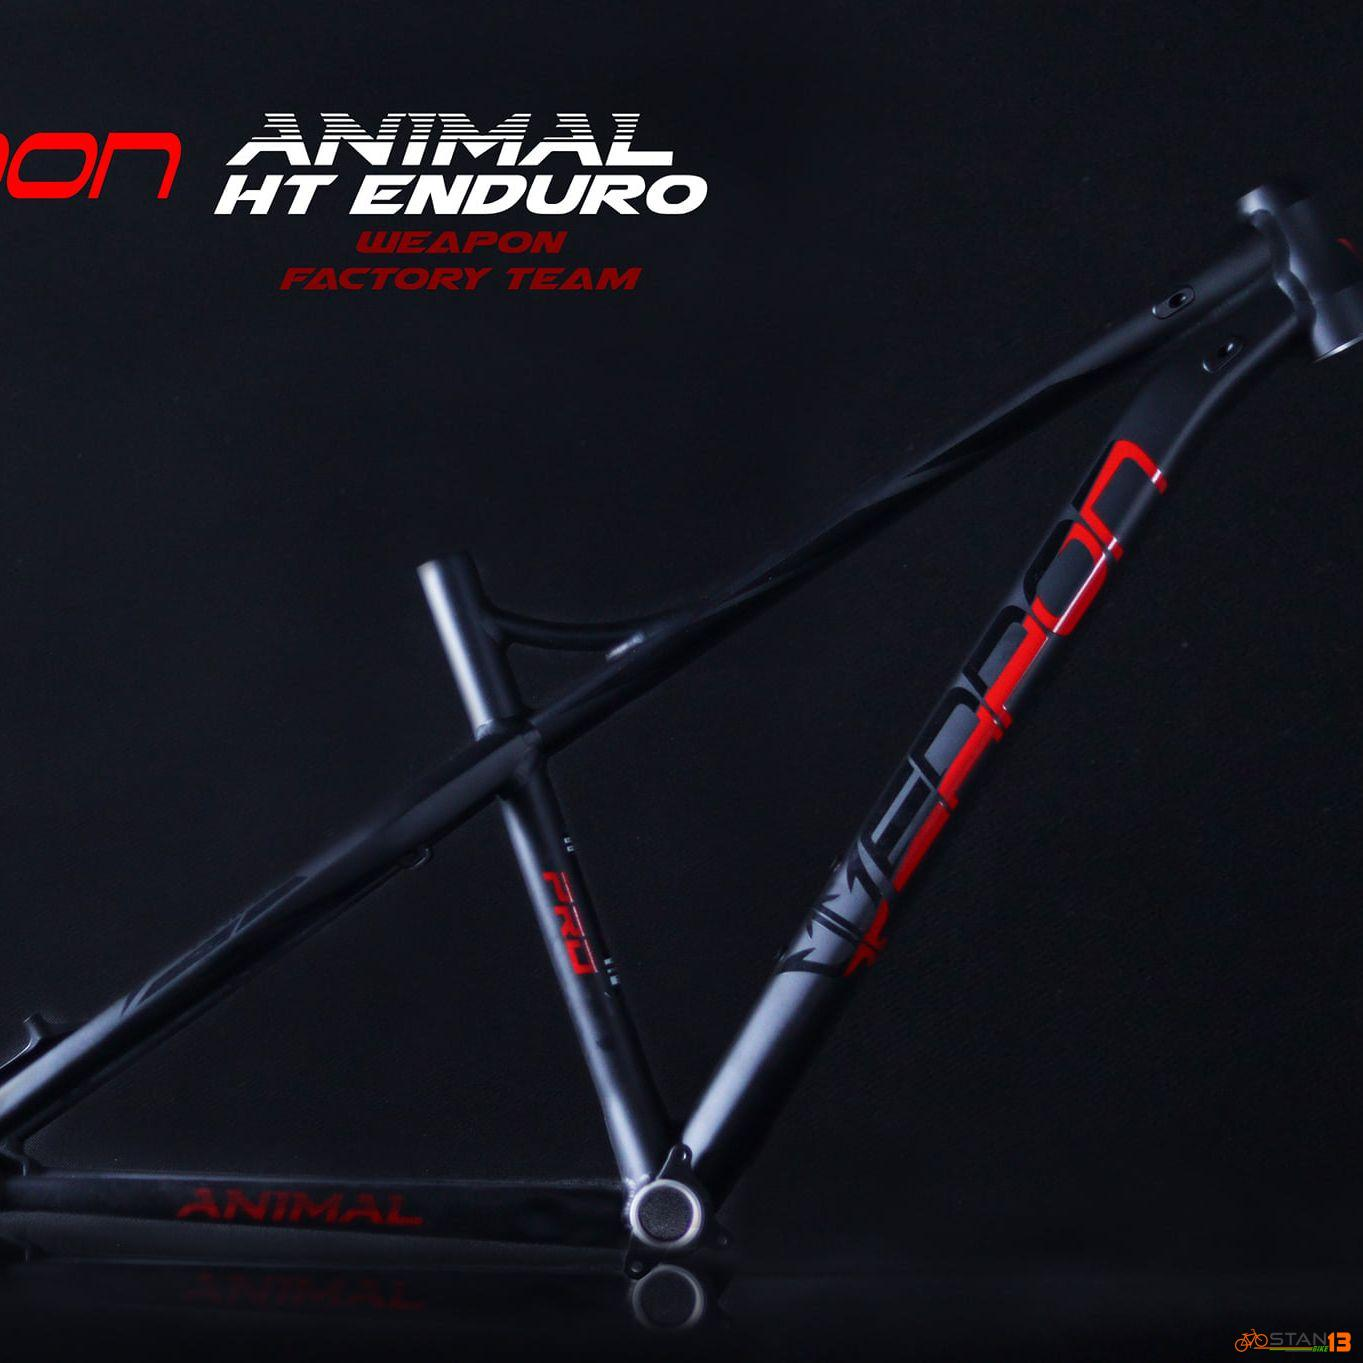 Frame Weapon Animal HT Enduro Limited Stocks